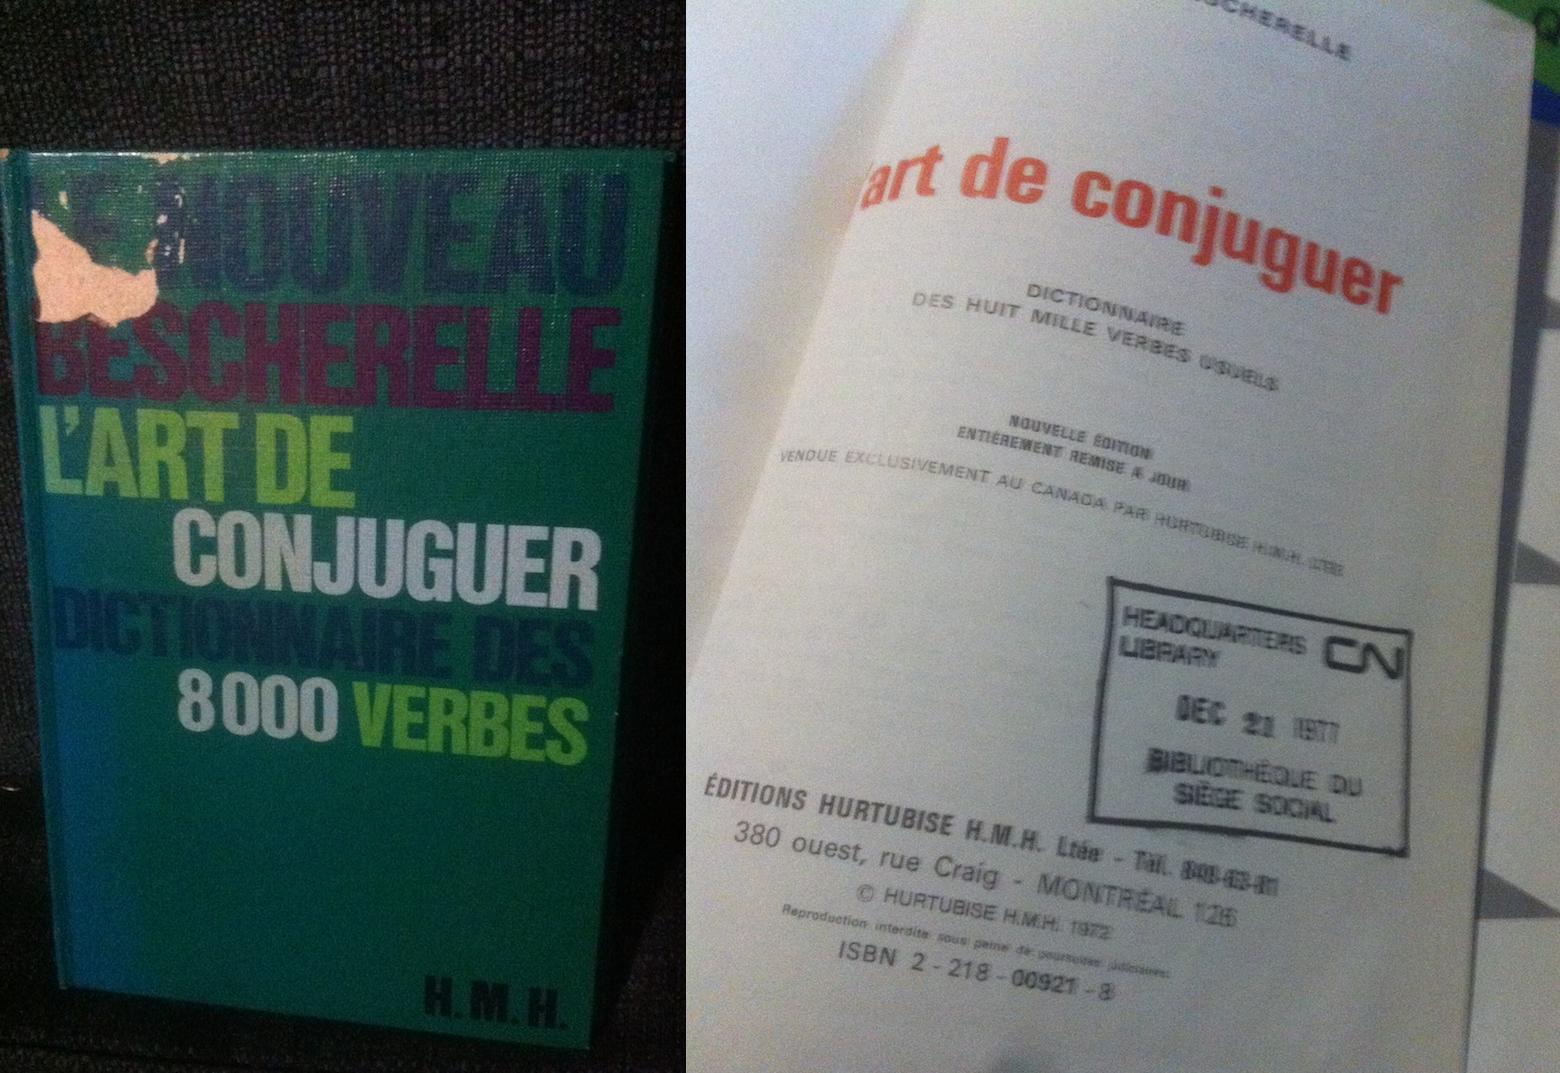 L Art De Conjuguer Le Nouveau Bescherelle 1972 Tampon Cn Headquarters Library Librairie Siege Social In 2020 Facebook Sign Up Facebook Sign Personalized Items